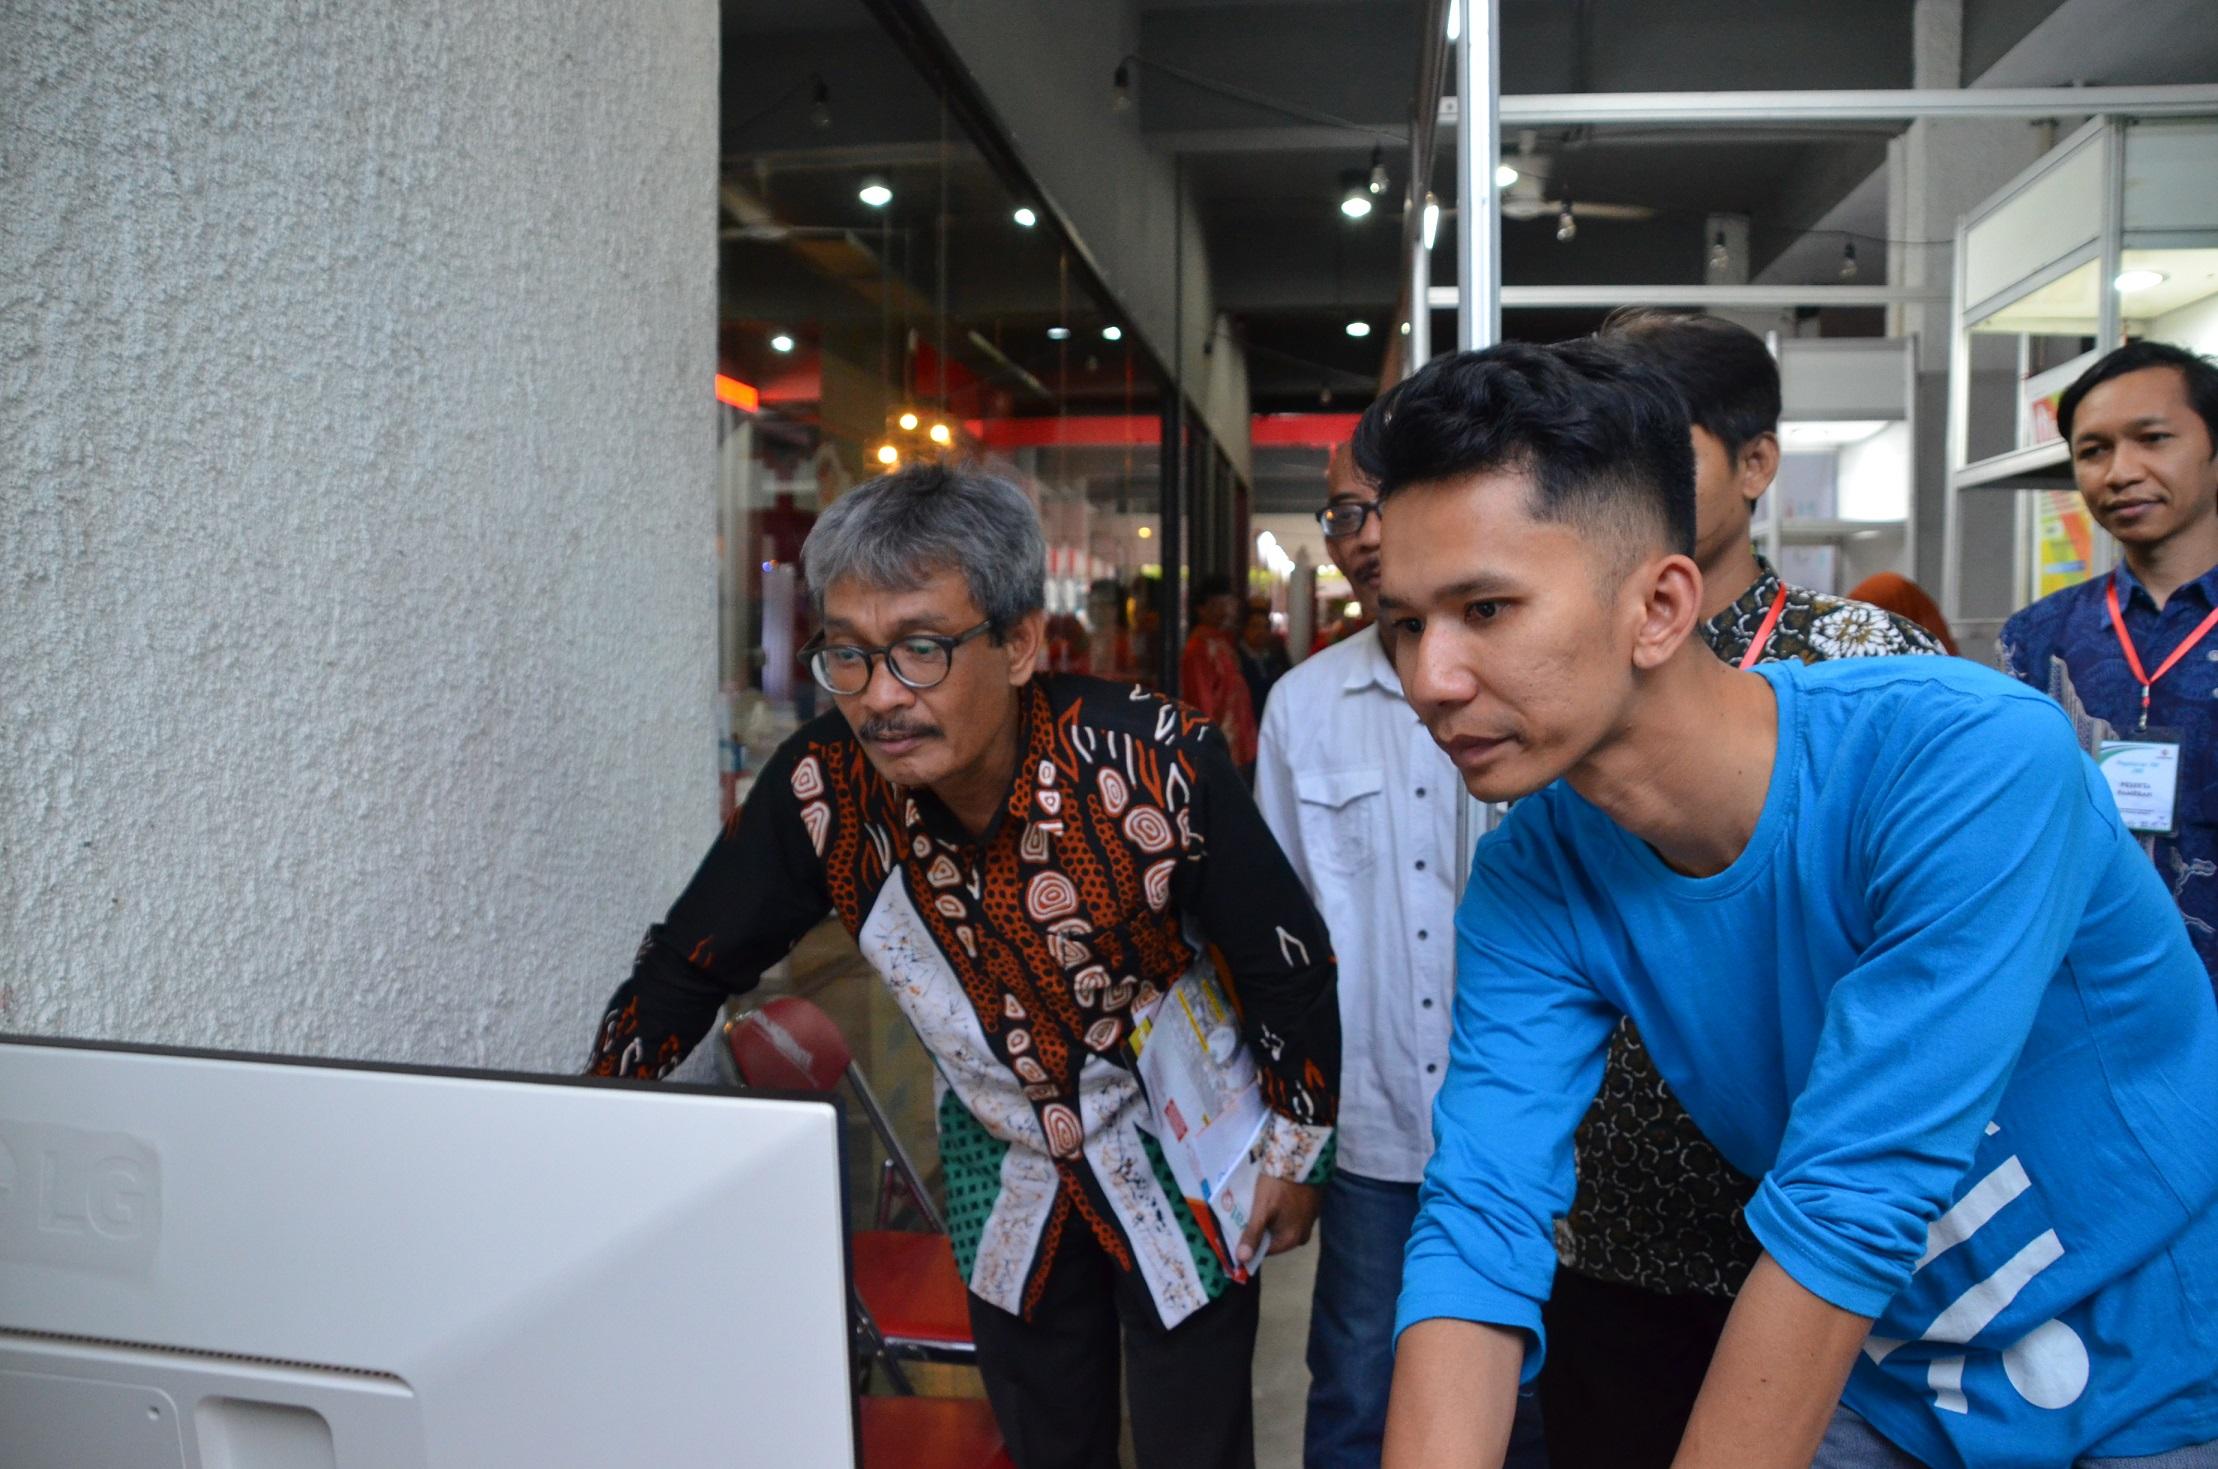 Dinas Kominfosandi Kota Yogyakarta menunjukkan aplikasi JSS pada Pagelaran TIK Tahun 2019